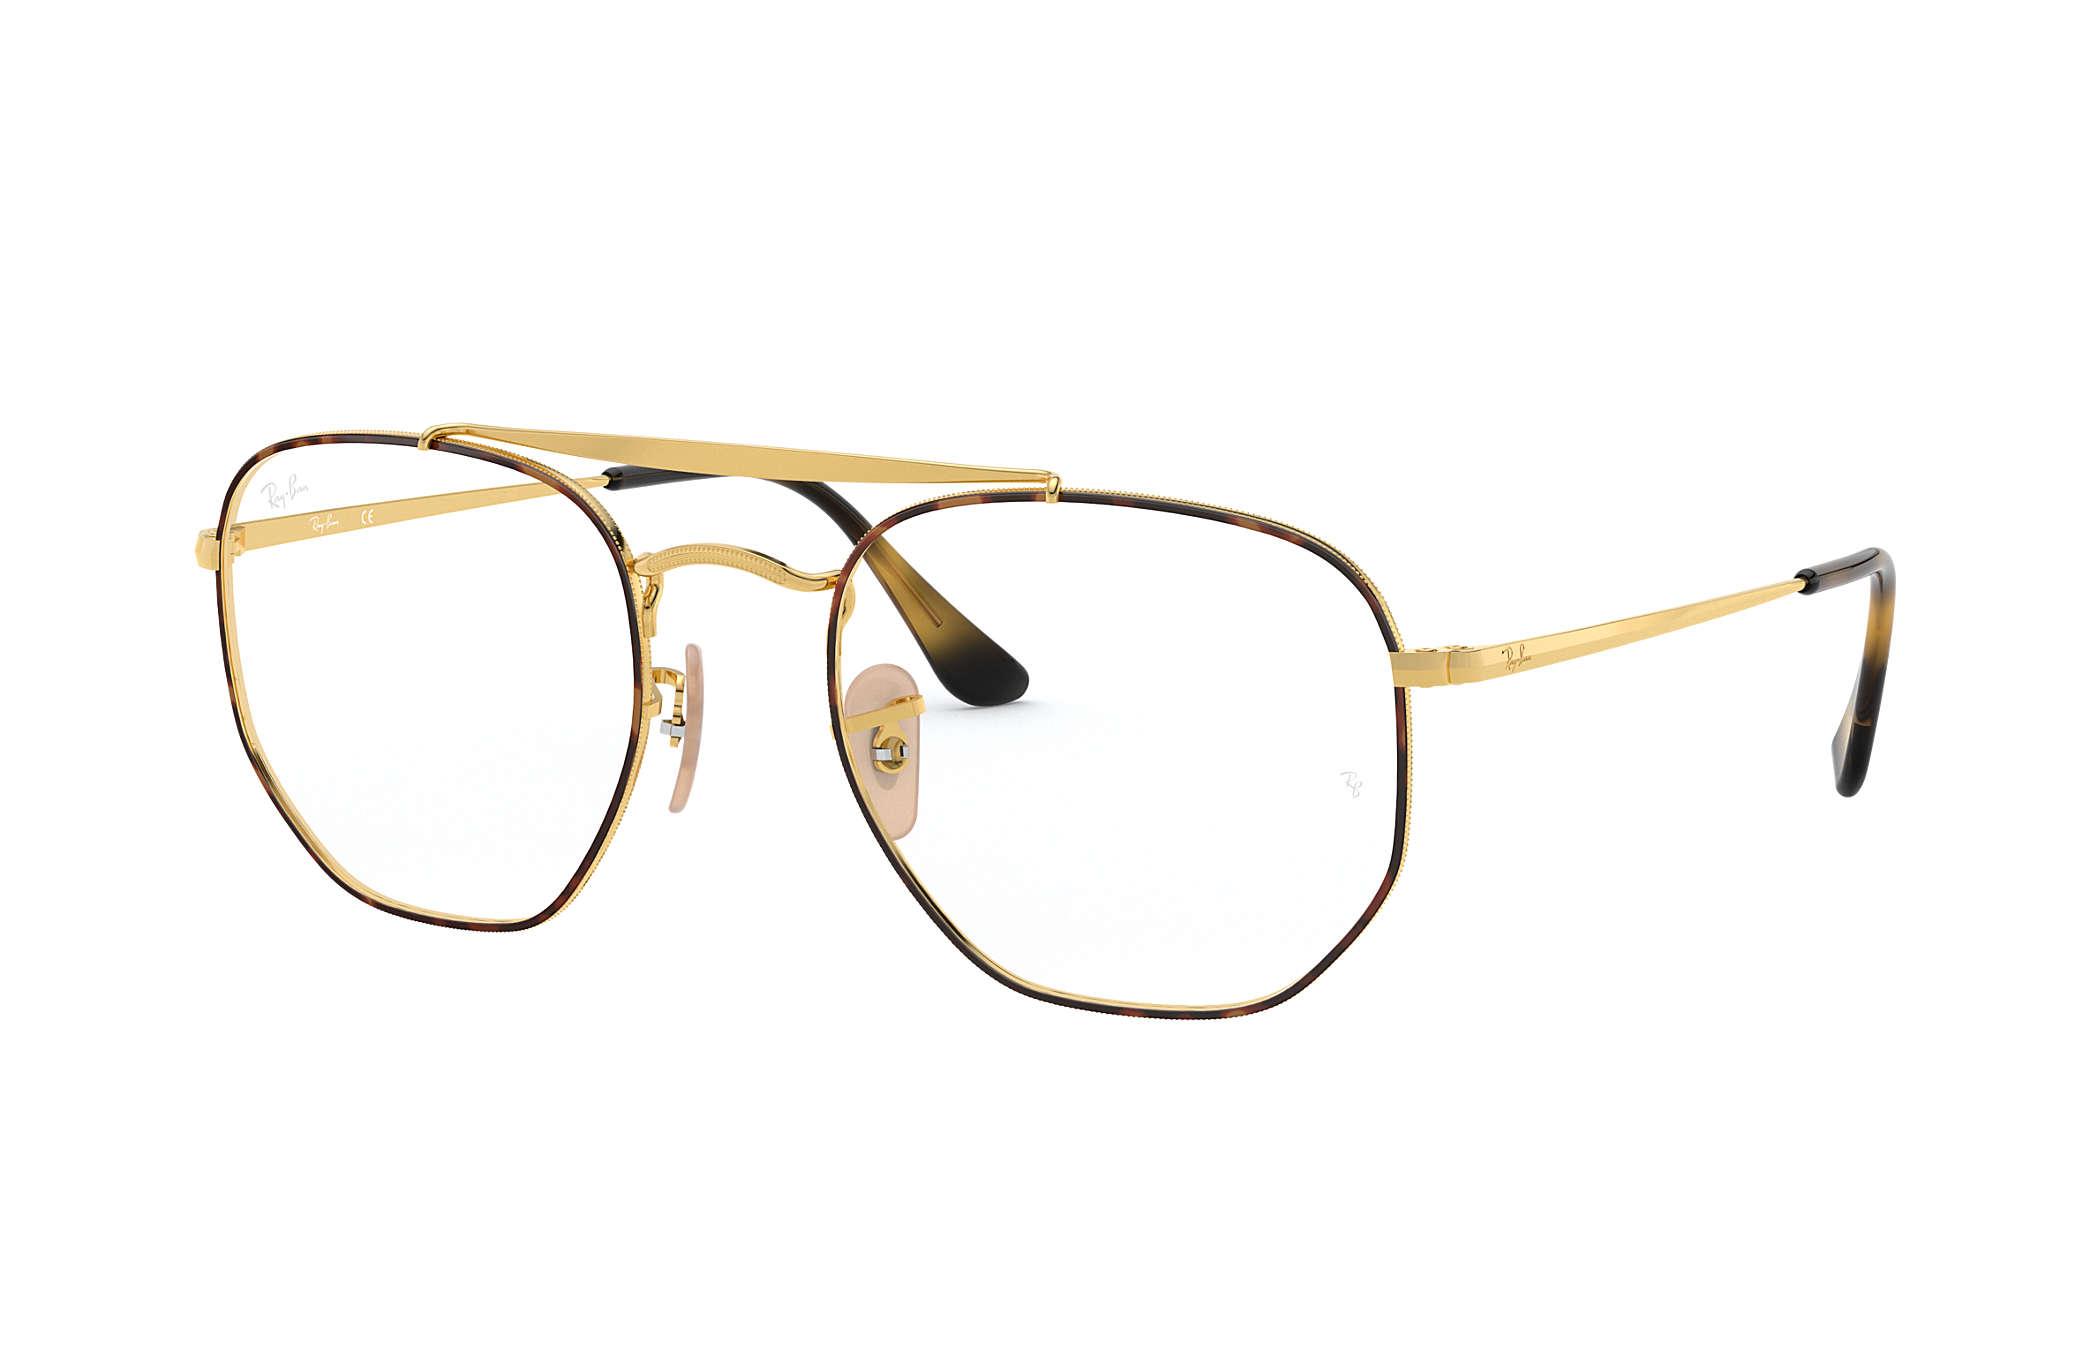 746019ef04 Ray-Ban prescription glasses Marshal Optics RB3648V Tortoise - Metal ...